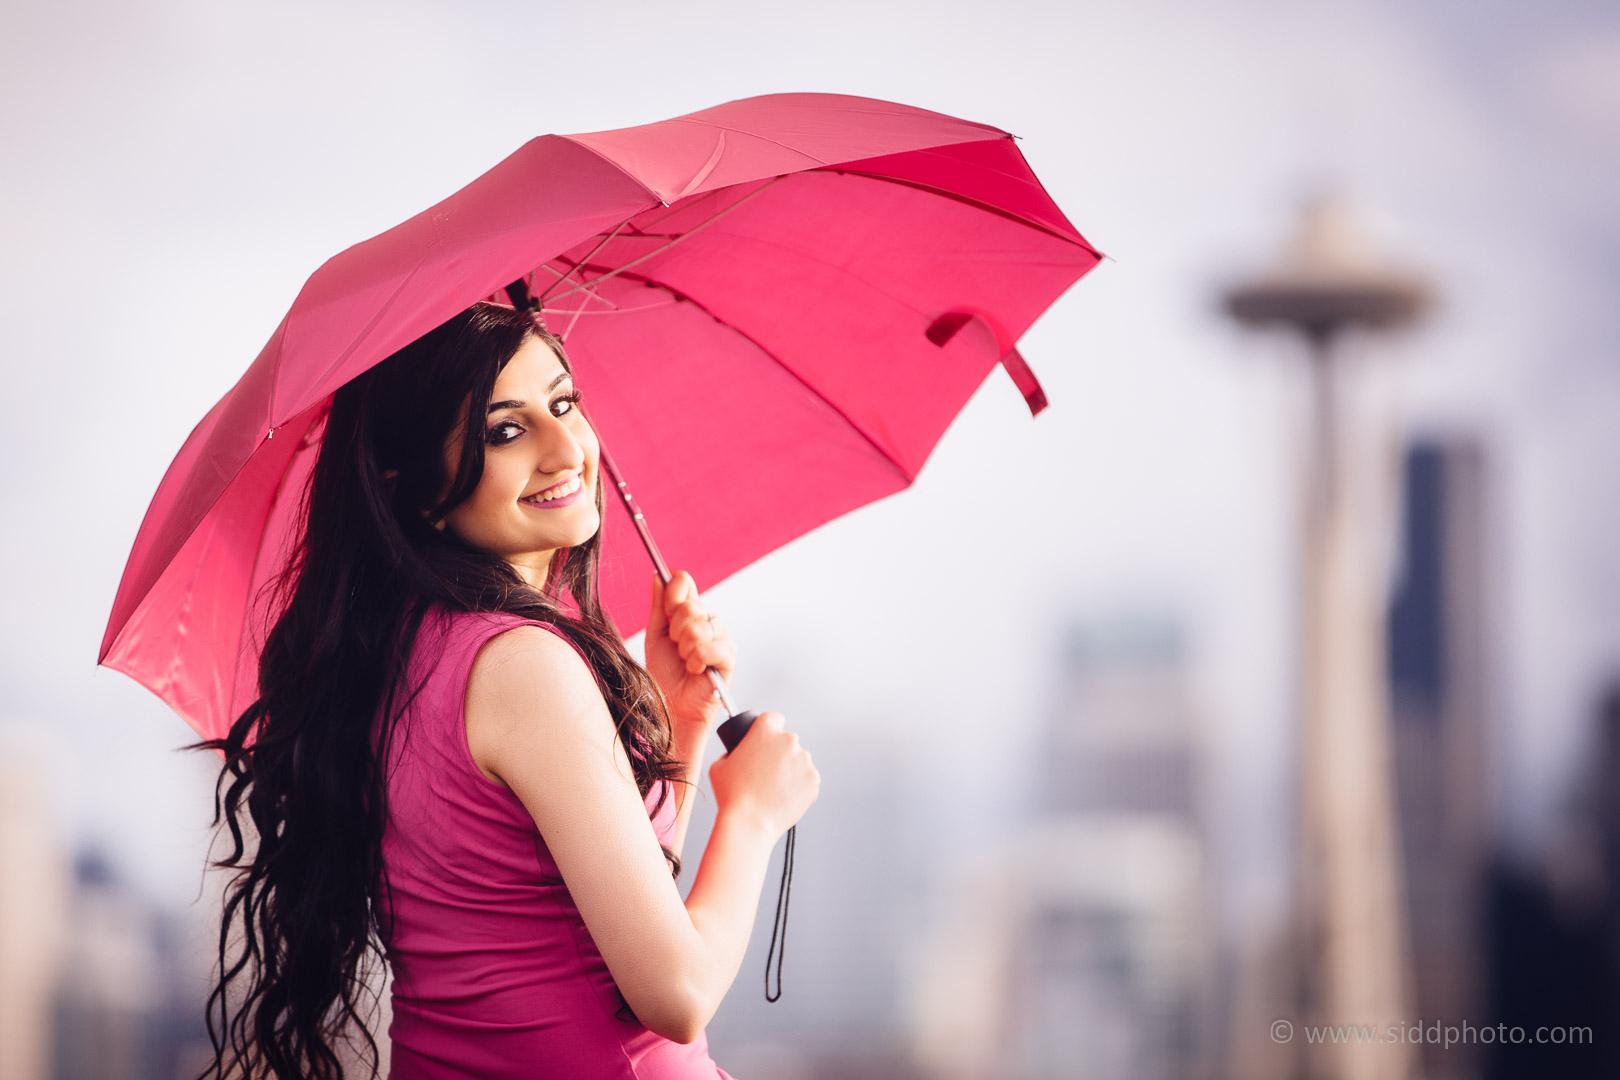 2014-12-28 - Sumedha Prateek Photoshoot - _O5C0849-01